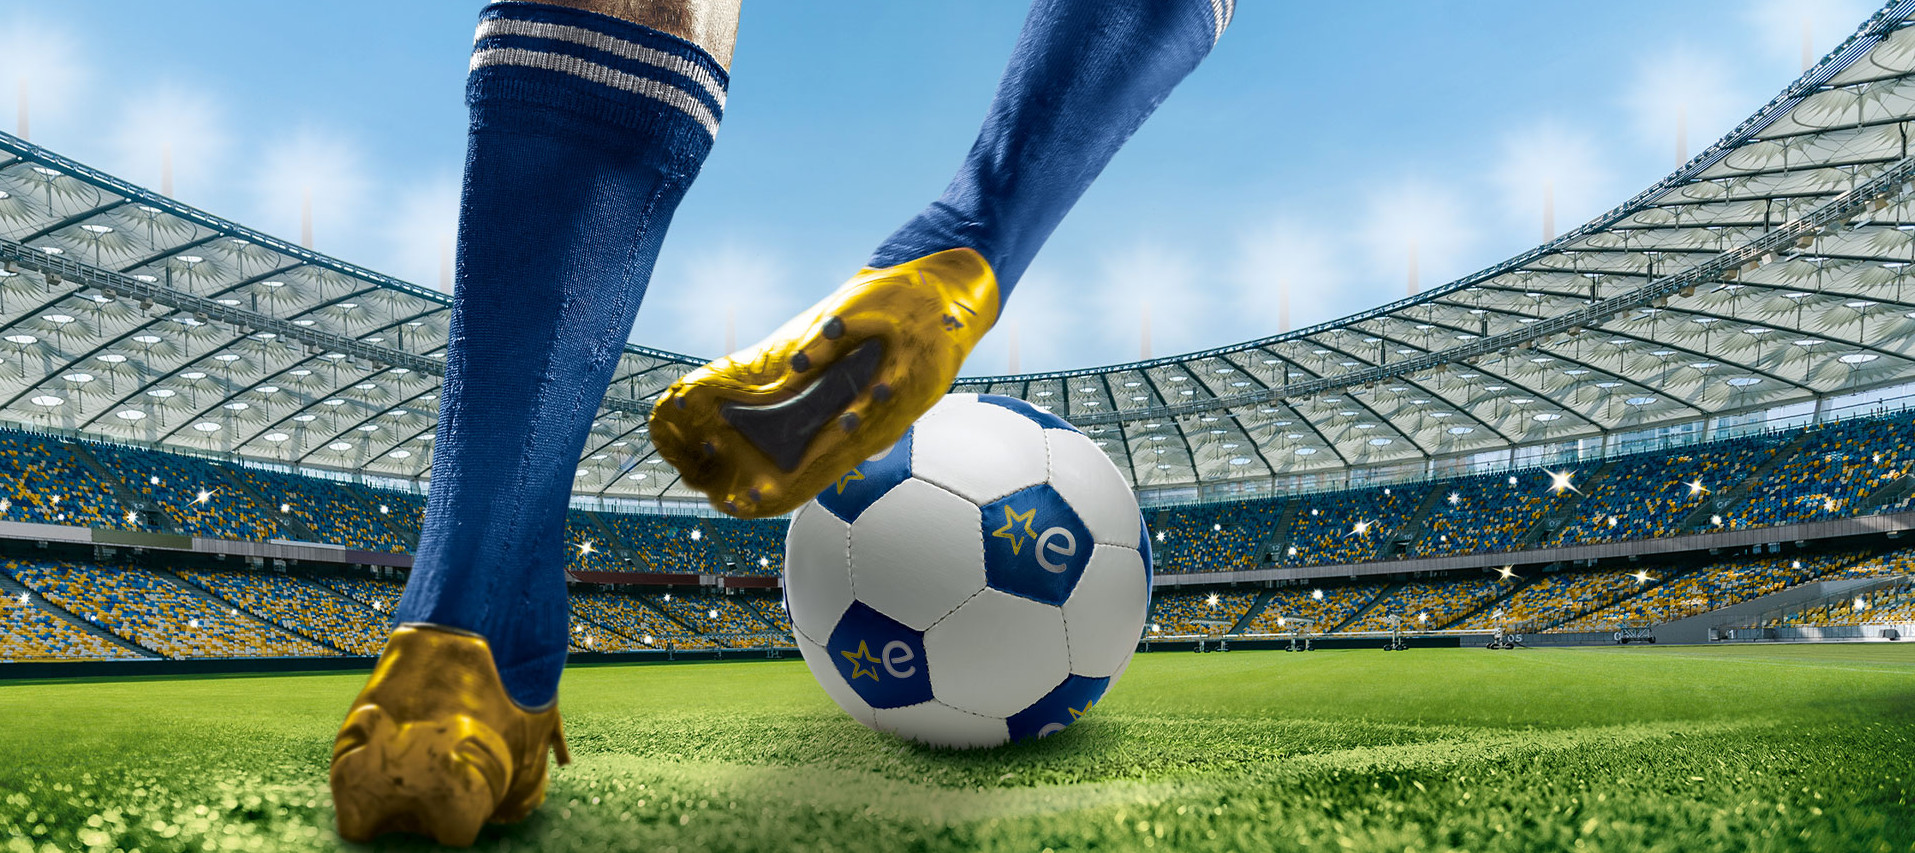 Fussball im Euronics-Stadion